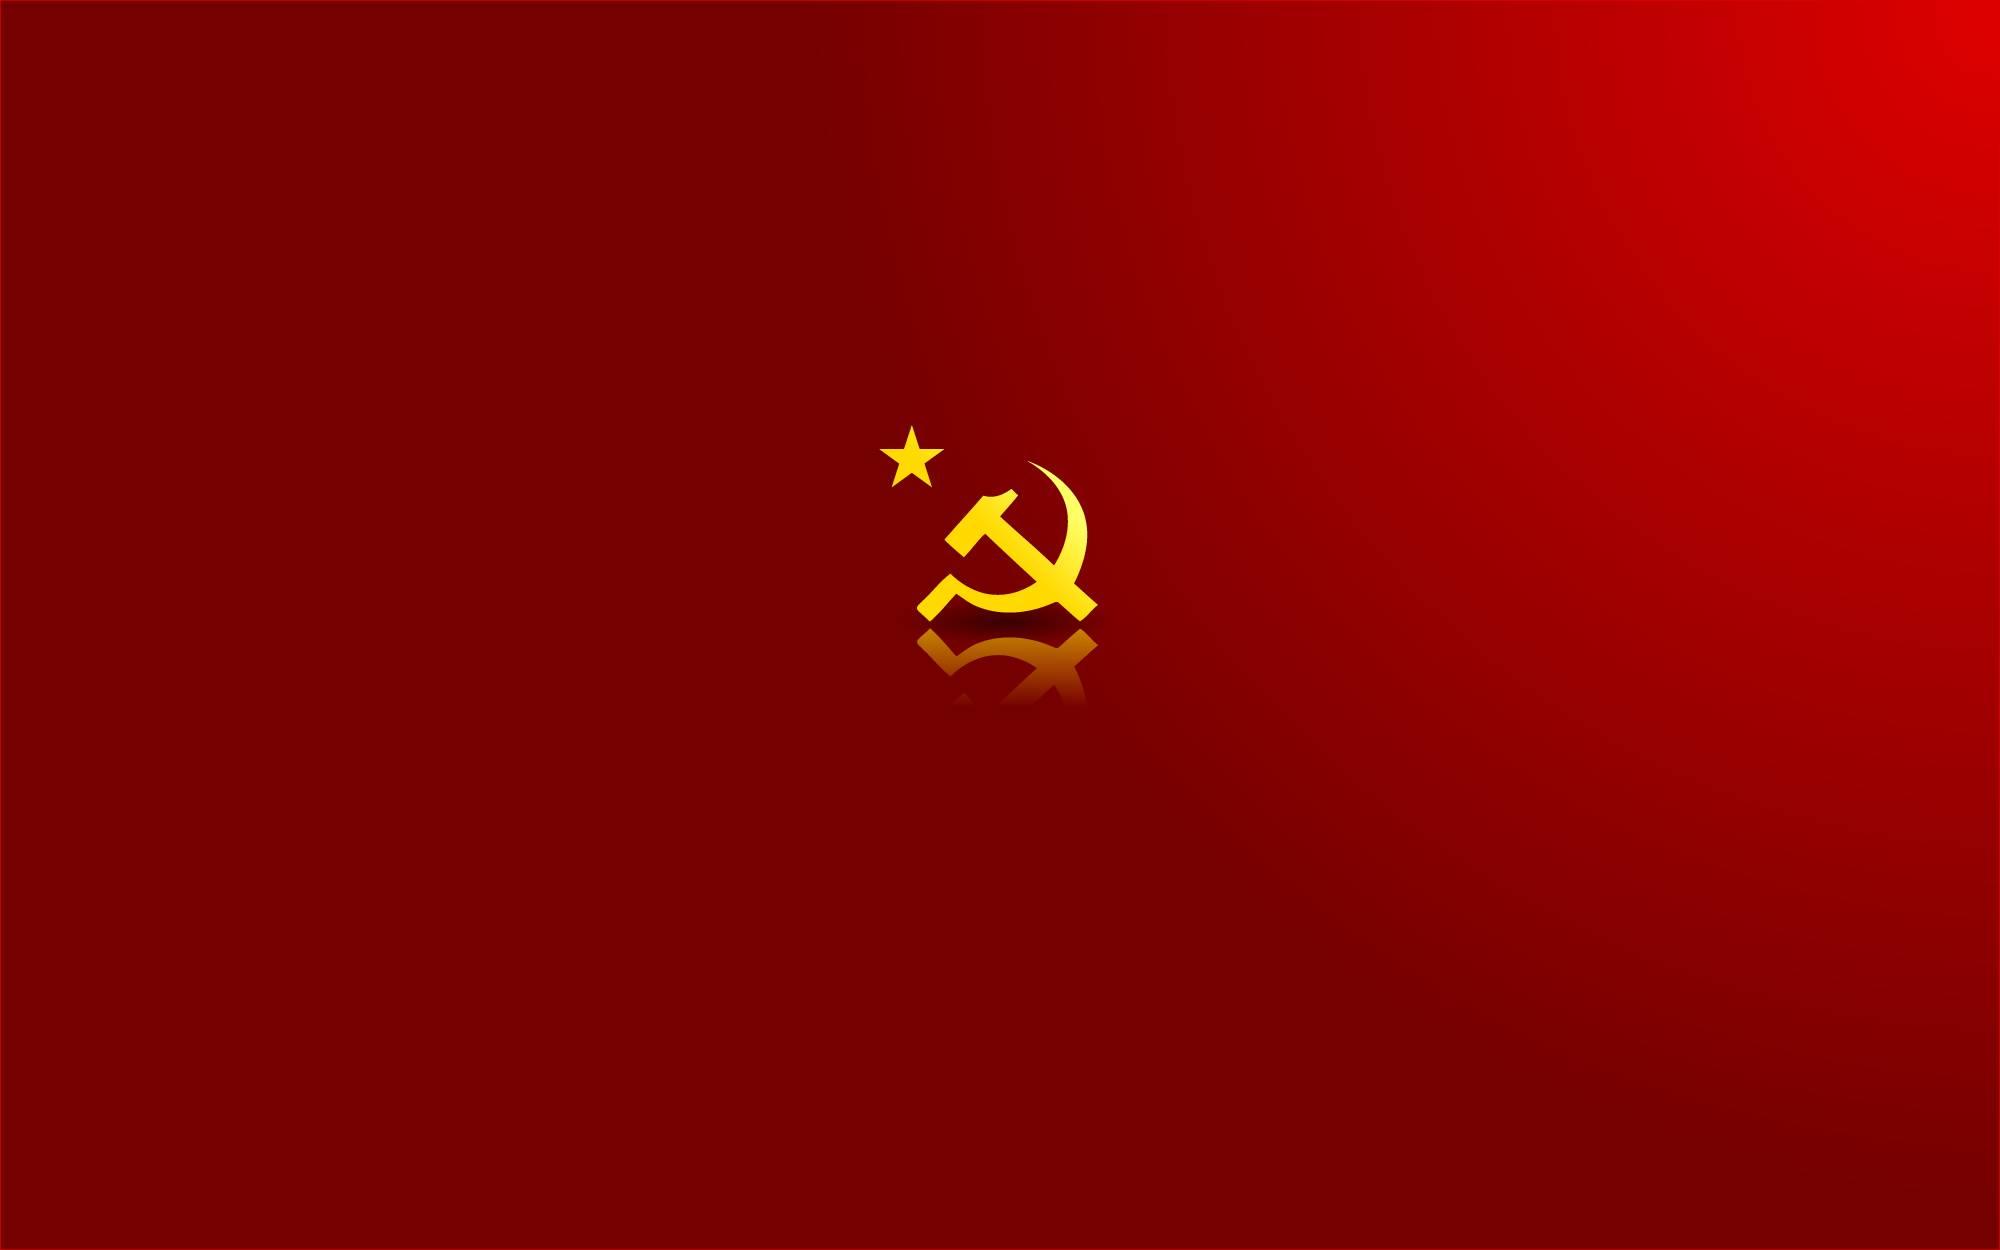 Communism Soviet 20001250 Wallpaper 623224 2000x1250